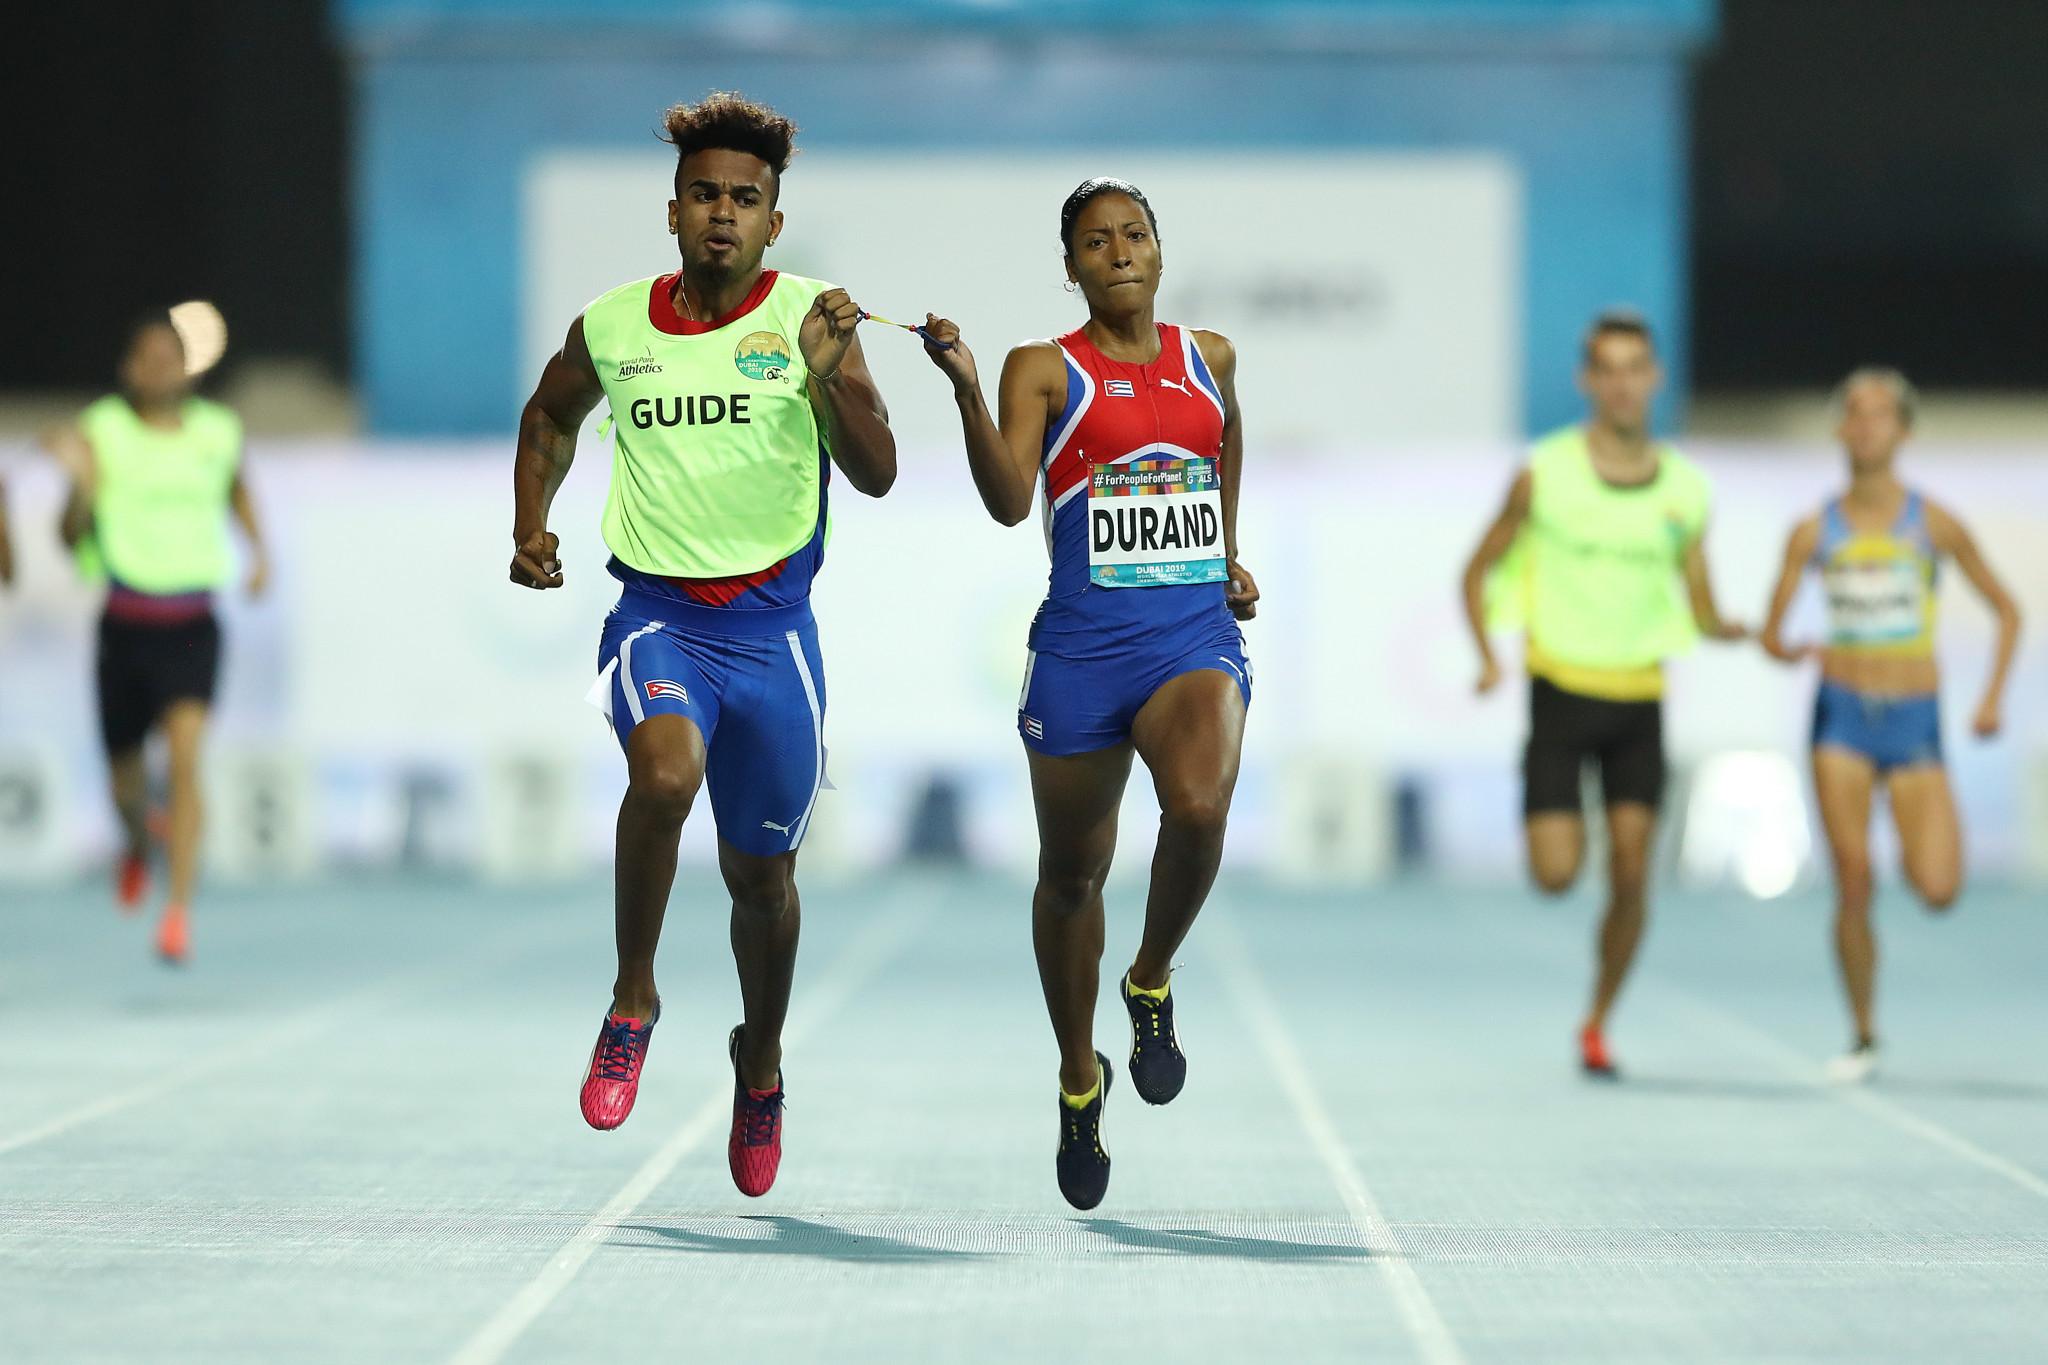 Perfect 10 for Durand at World Para Athletics Championships